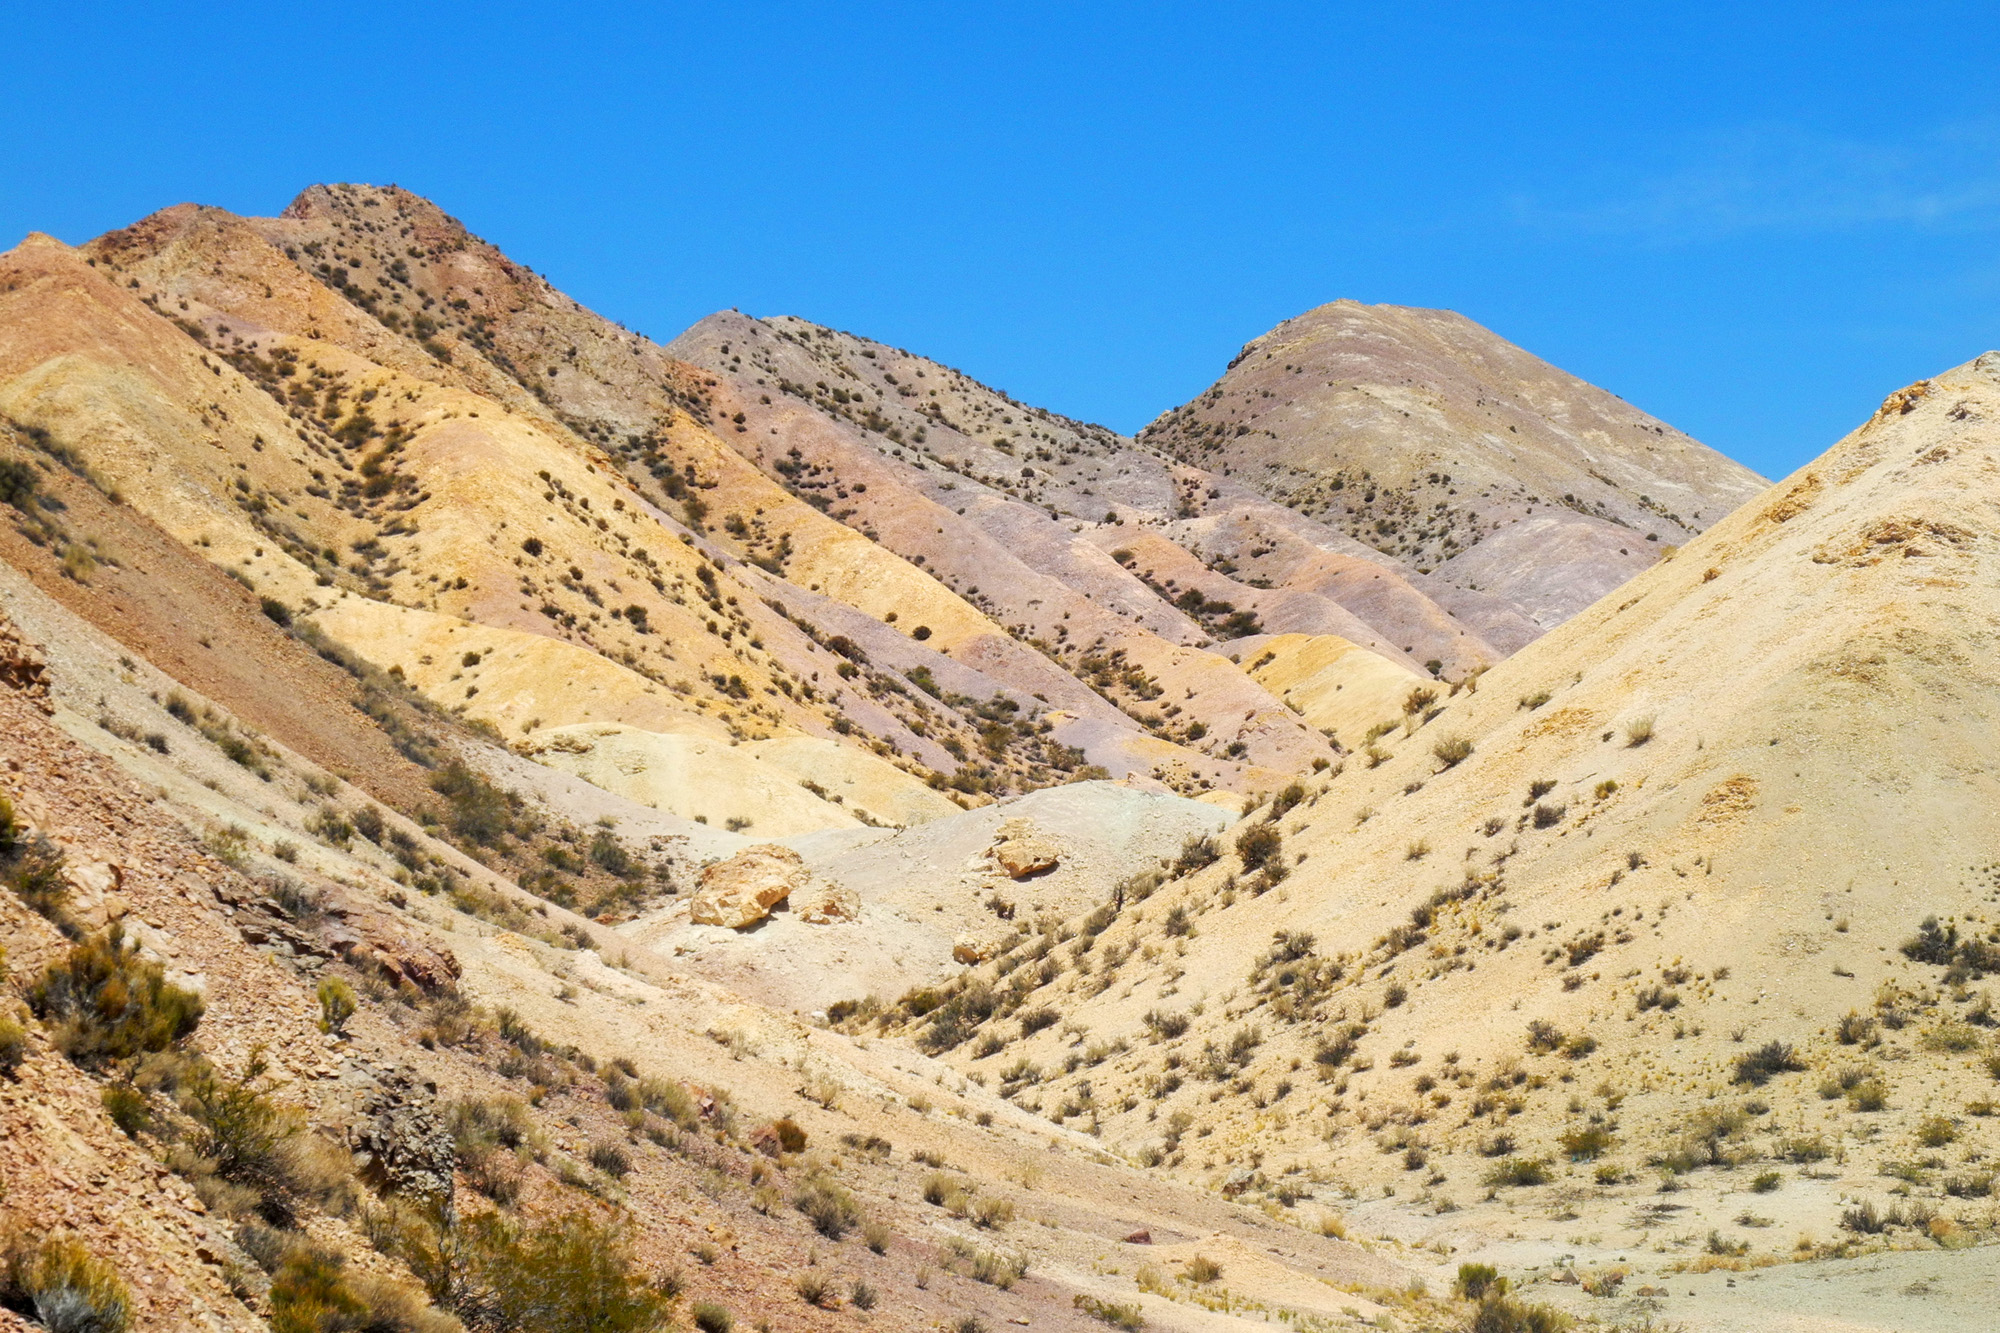 wine-TROTTERS_oenotourisme_wine-tourism-agency_tour_vino_vin_turismo_ARGENTINA_Mendoza_trekking_hiking_horseback-riding_alta-montana_Andes_2_WEB-2000px.jpg